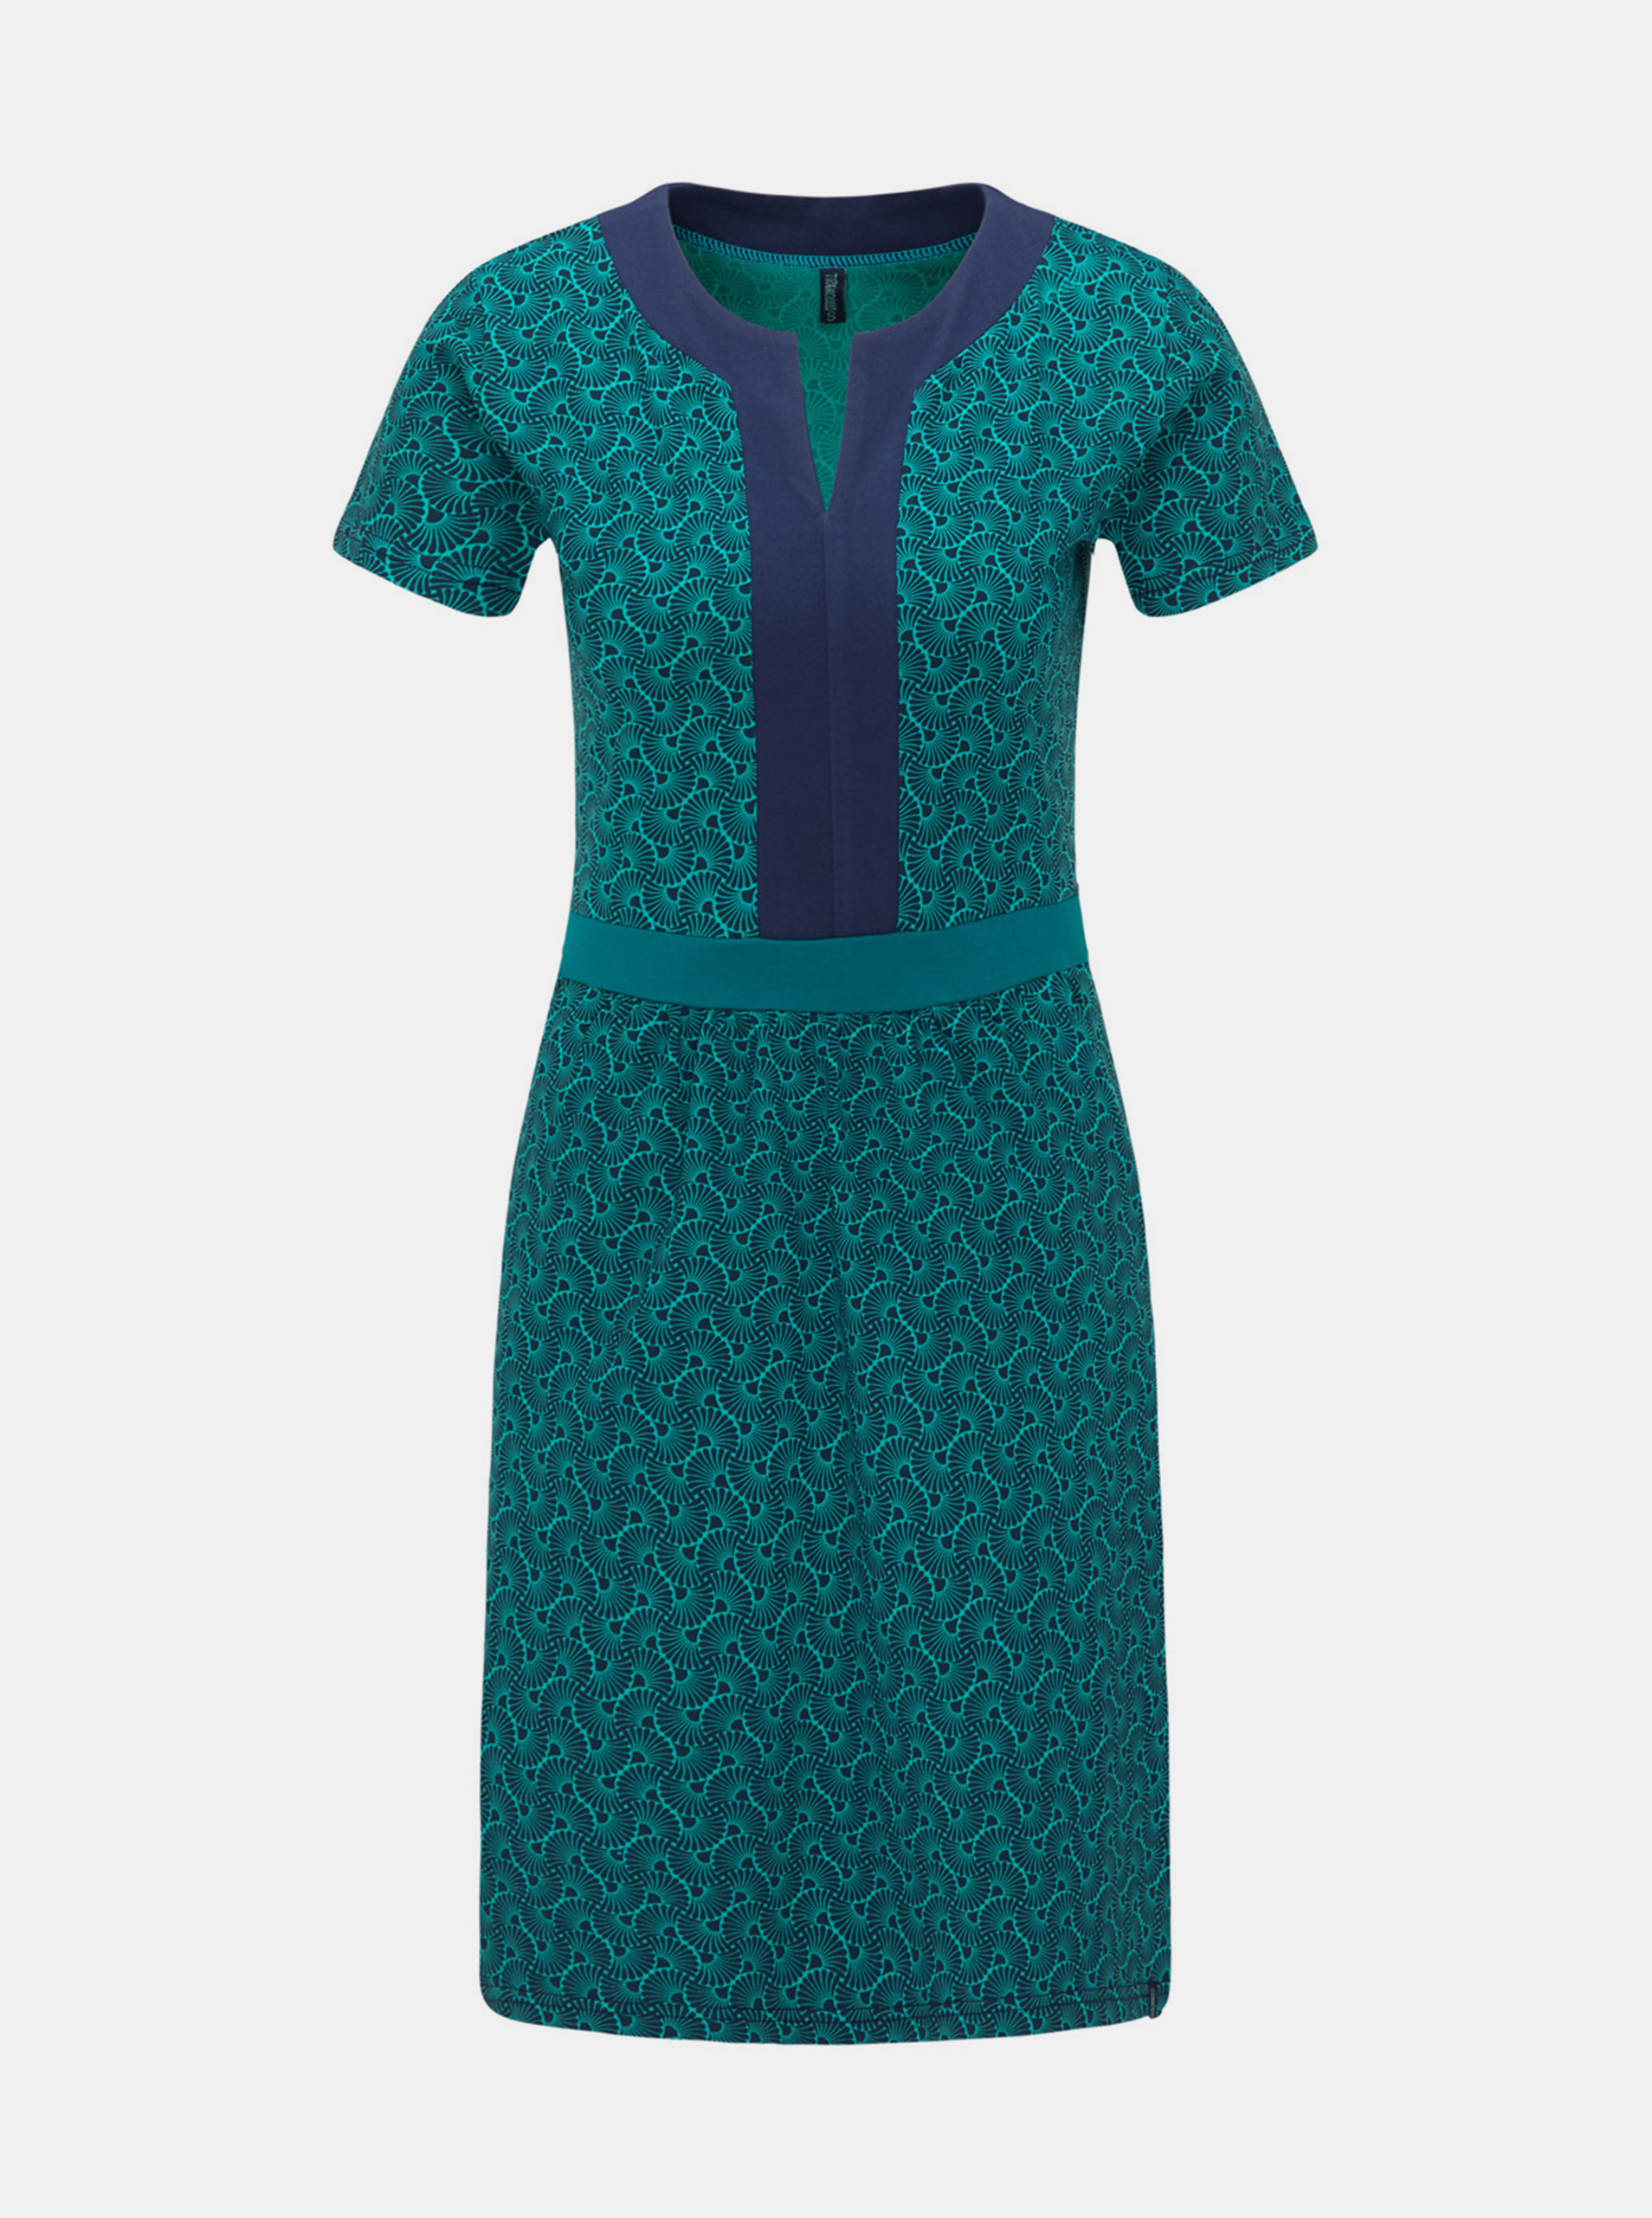 Tranquillo petroleum dress patterned